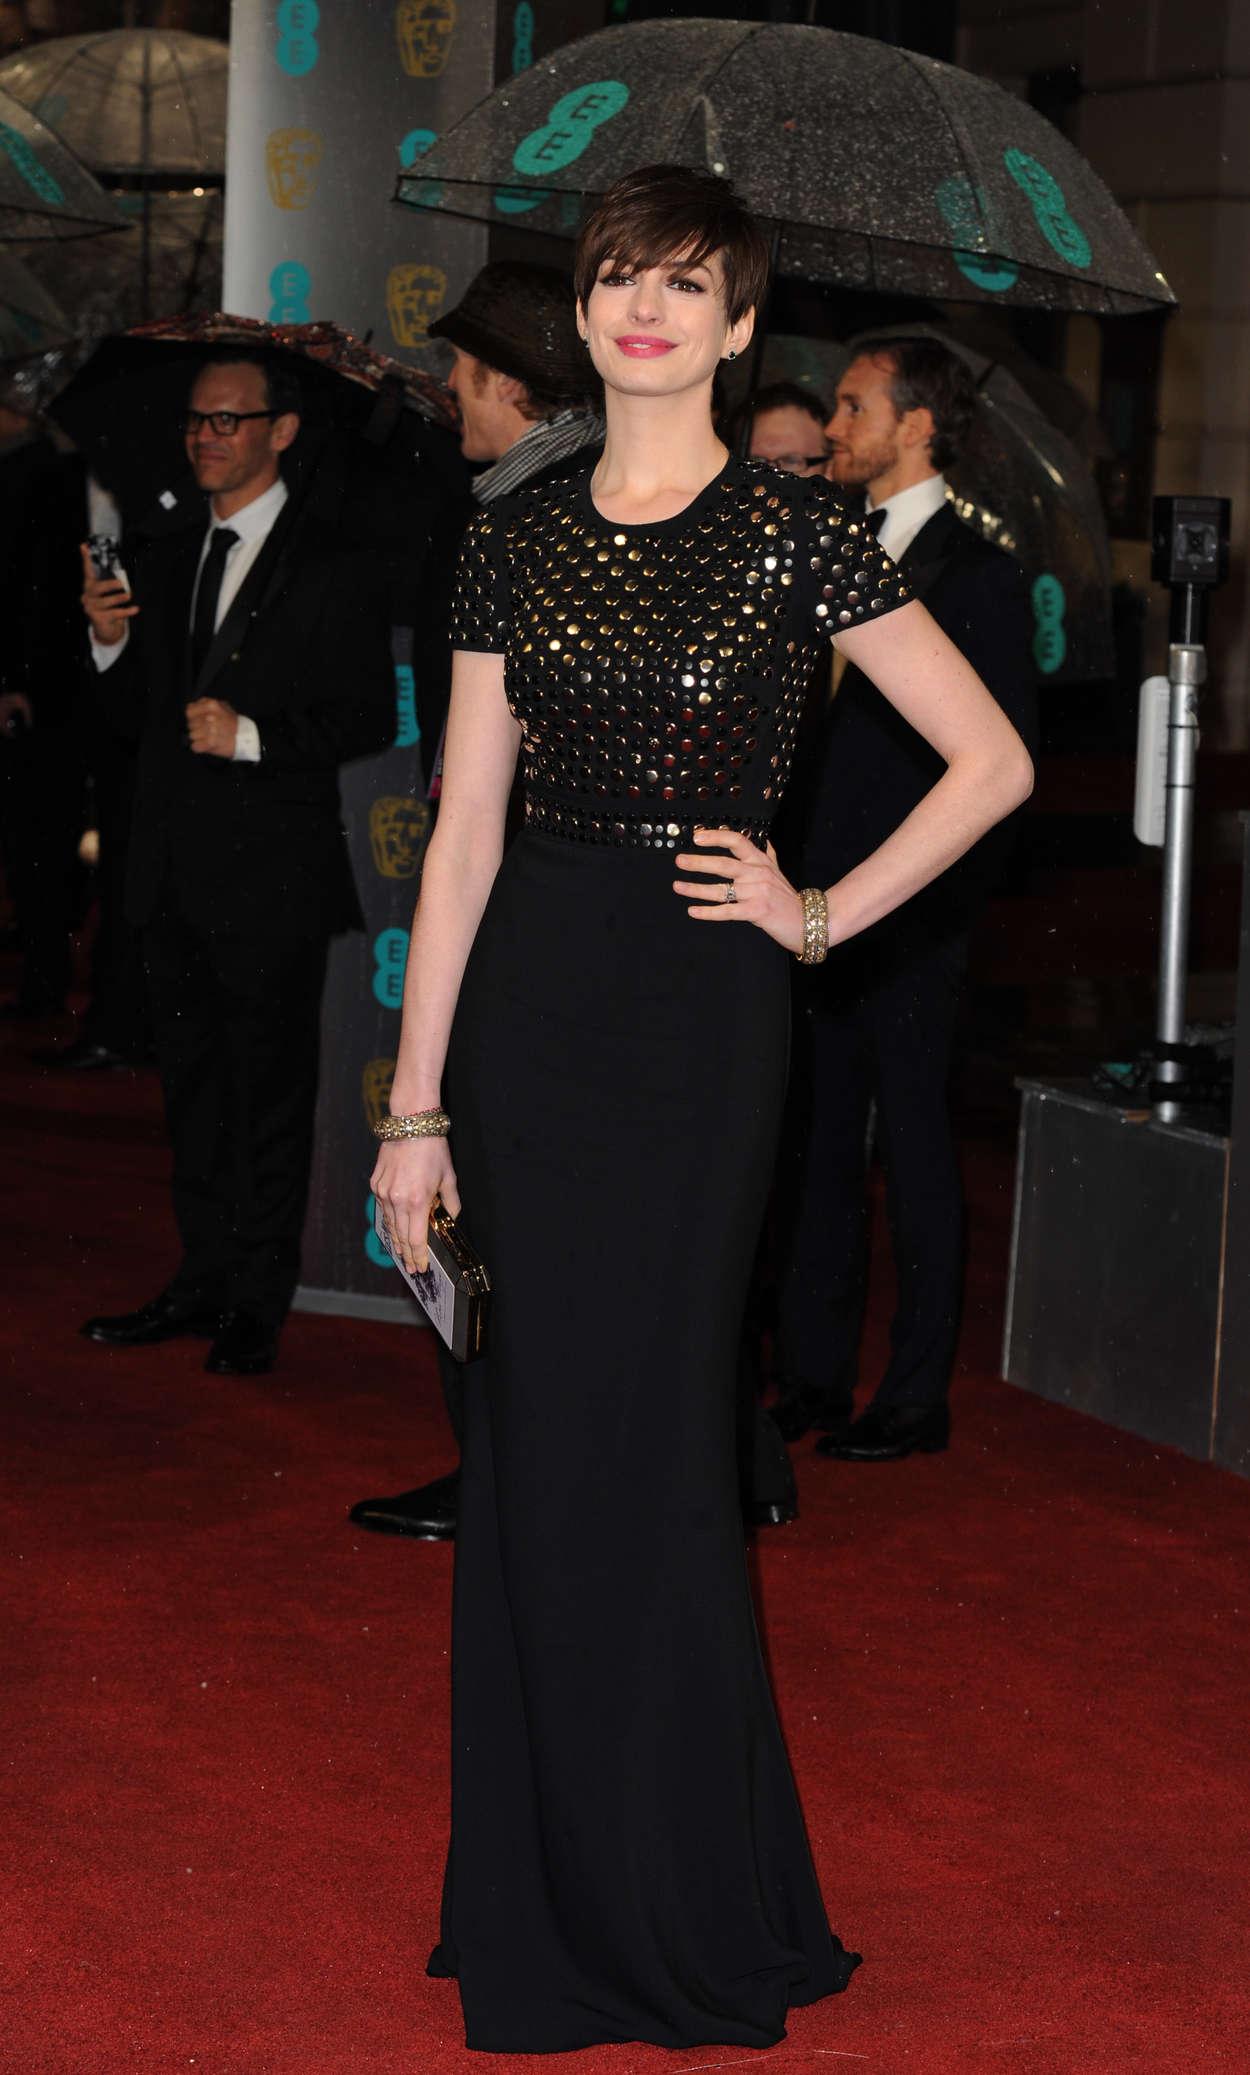 Anne Hathaway - Oscar 2013 - Vanity Fair Party in West